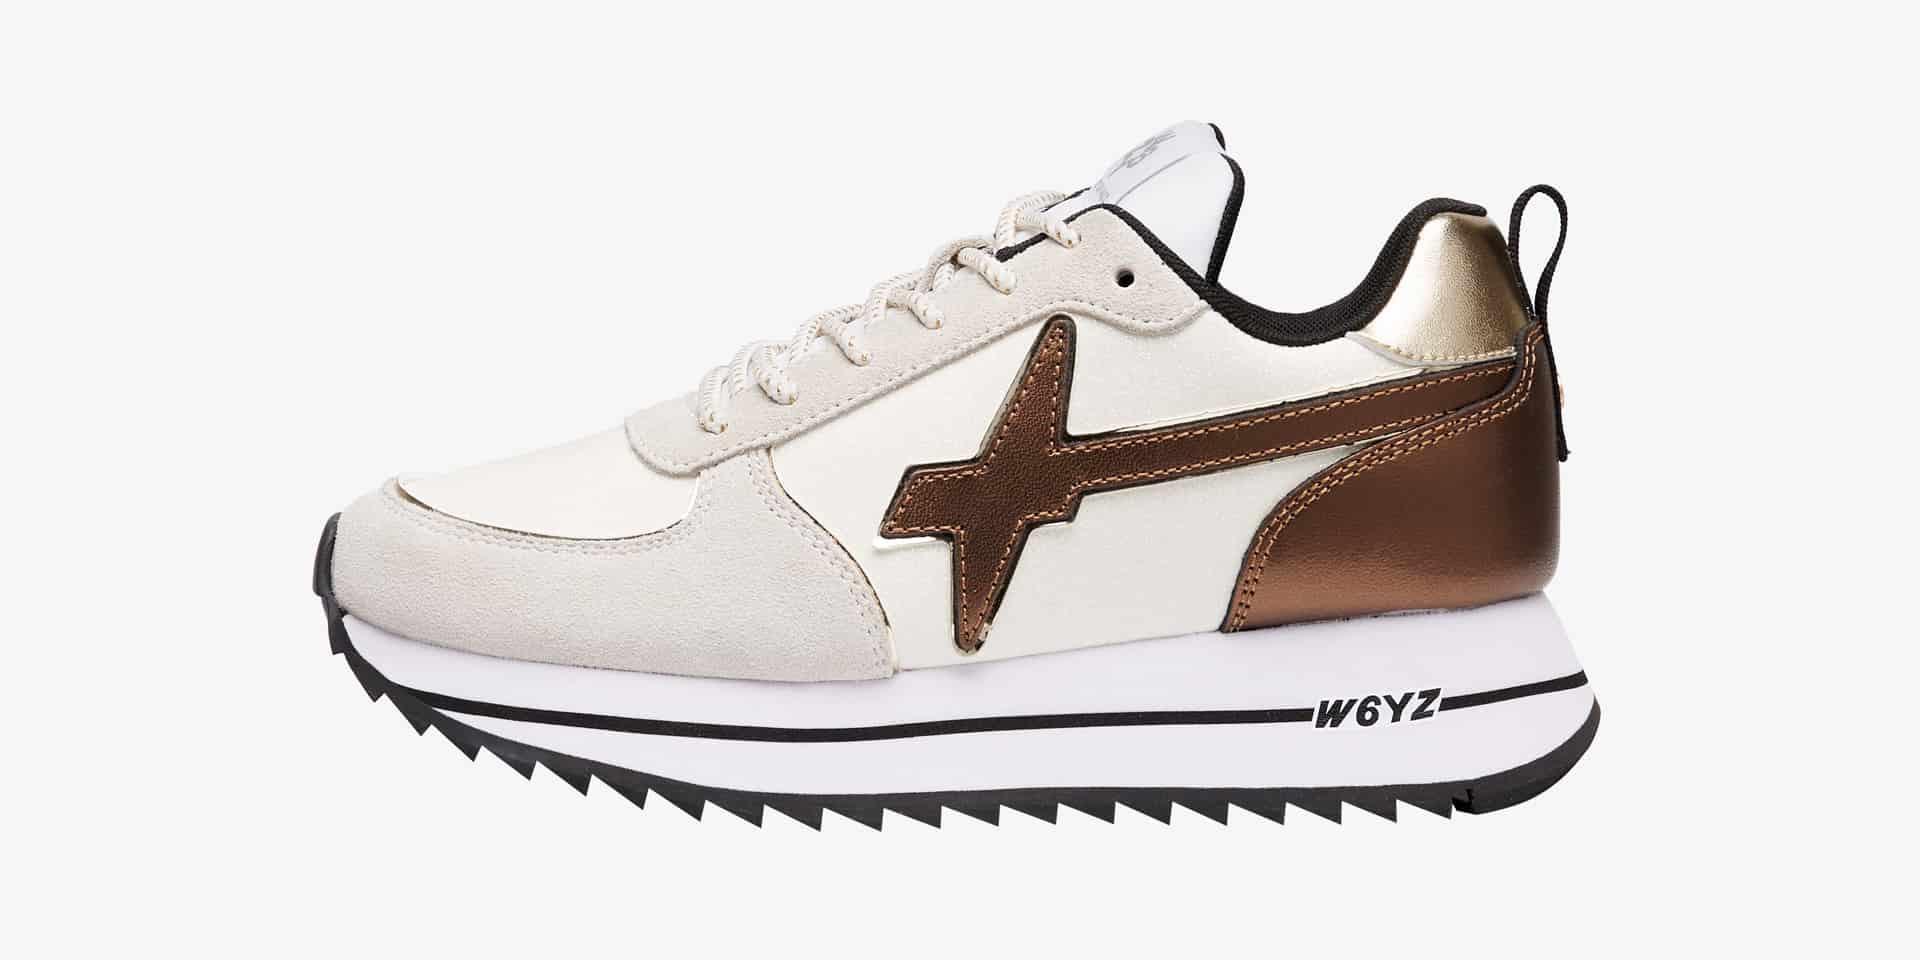 HER-W. - Sneaker in suede e glitter - Bianco